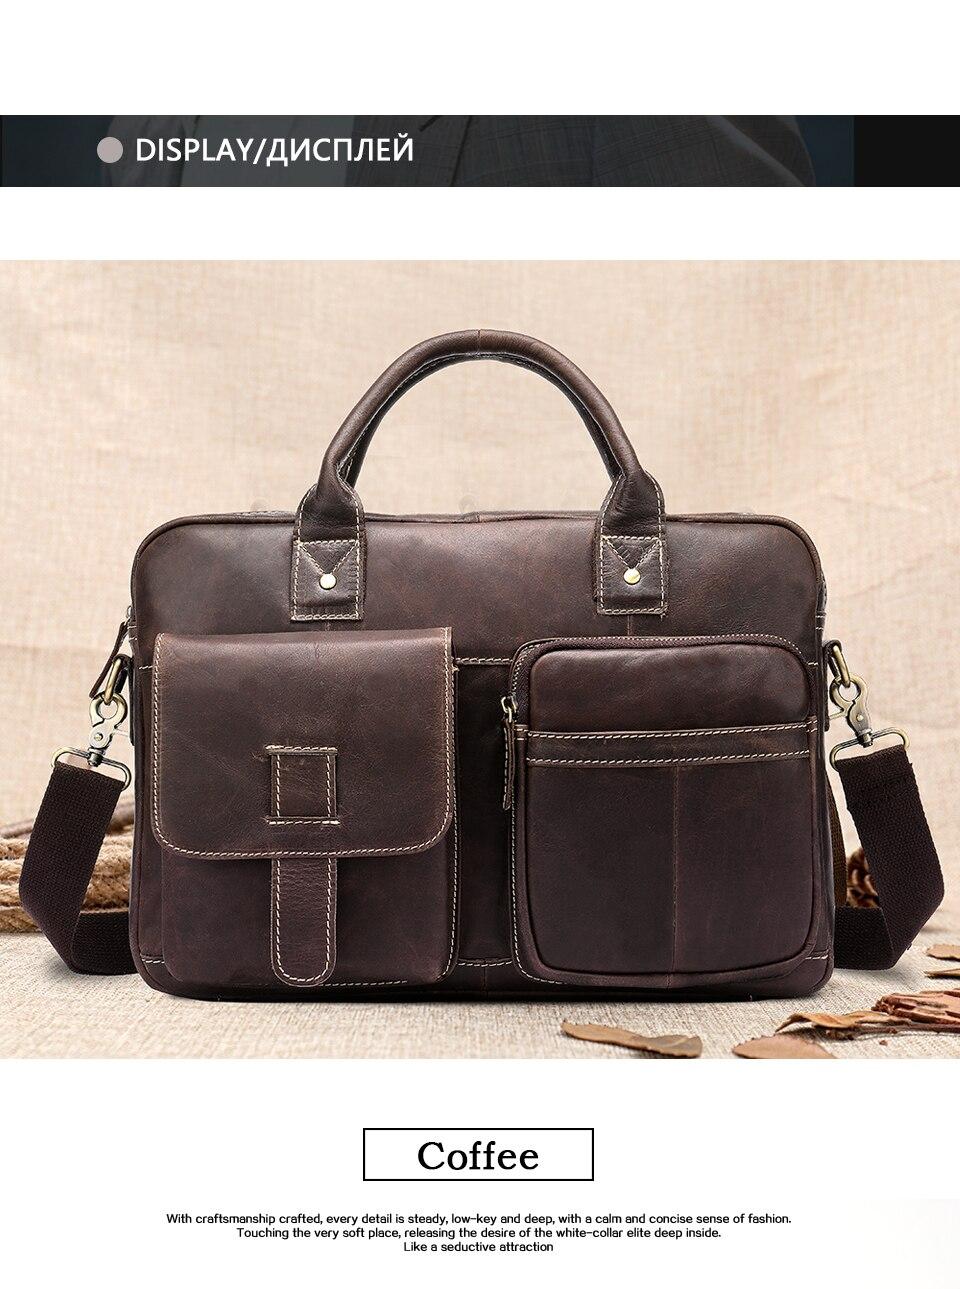 HTB1NPbvasfrK1Rjy1Xdq6yemFXaG WESTAL men's briefcase bag men's genuine Leather laptop bag office bags for men business porte document briefcase handbag 8503